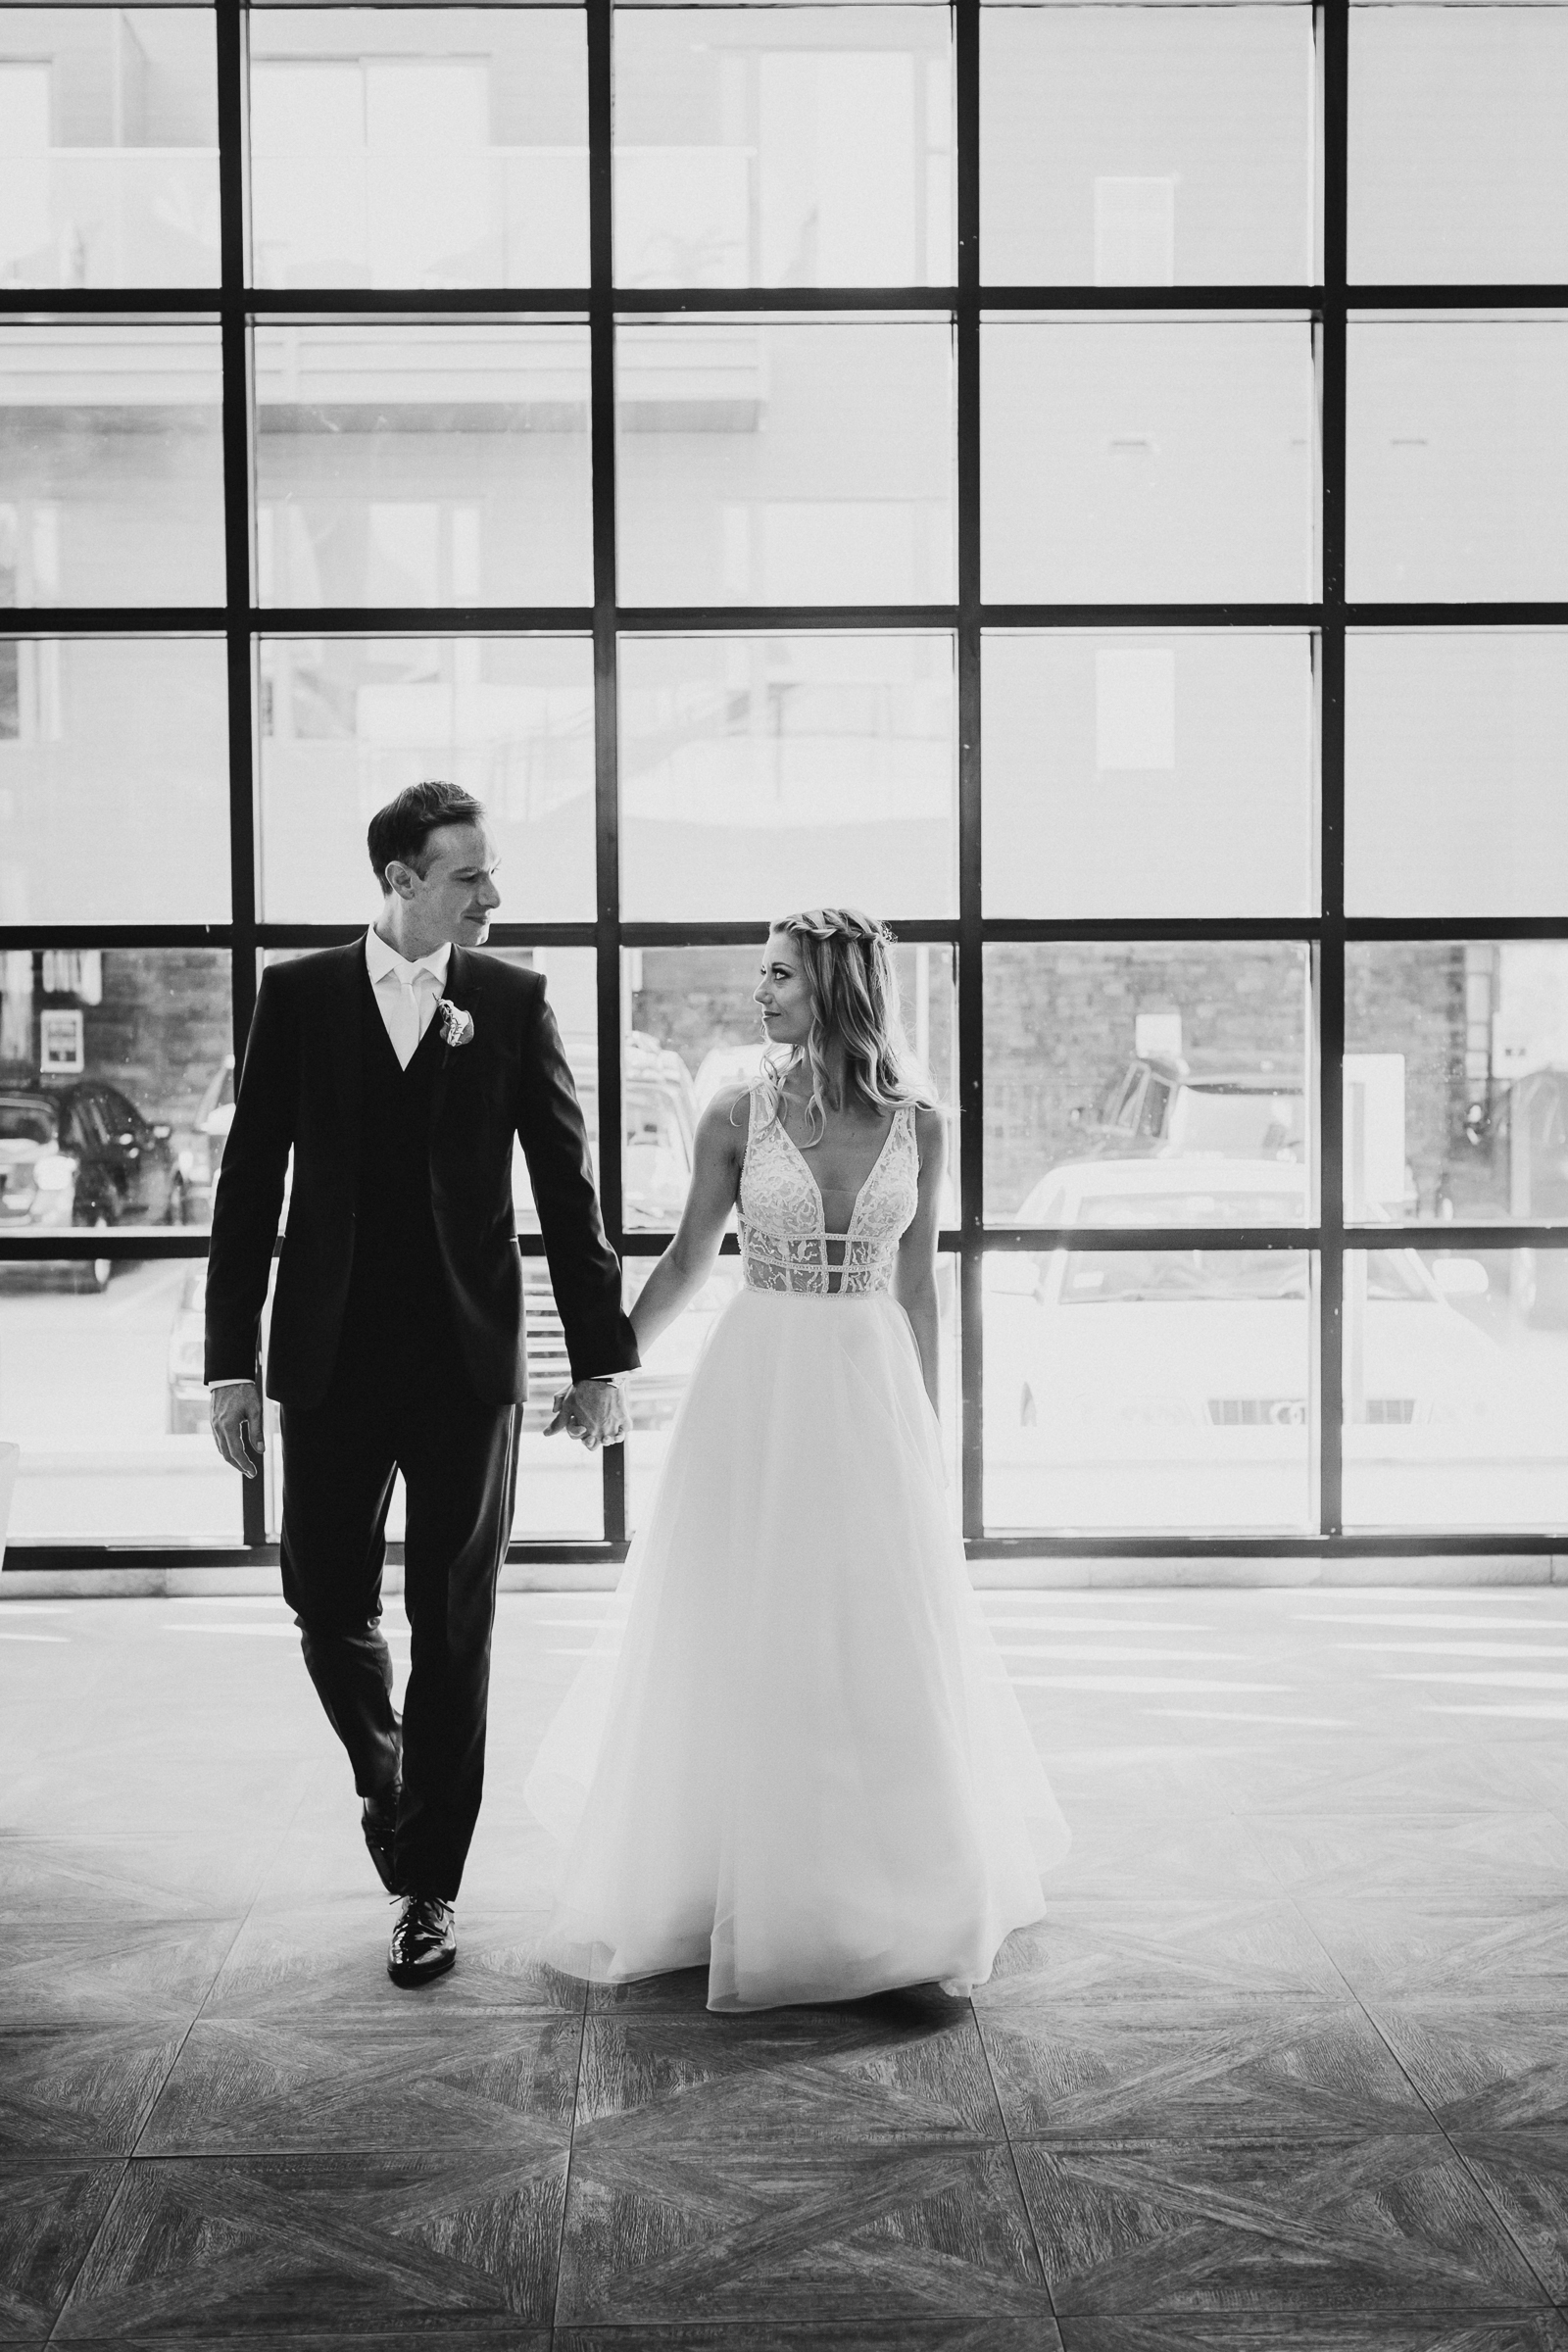 Ravel-Hotel-Penthouse-808-Long-Island-City-New-York-Documentary-Wedding-Photographer-33.jpg